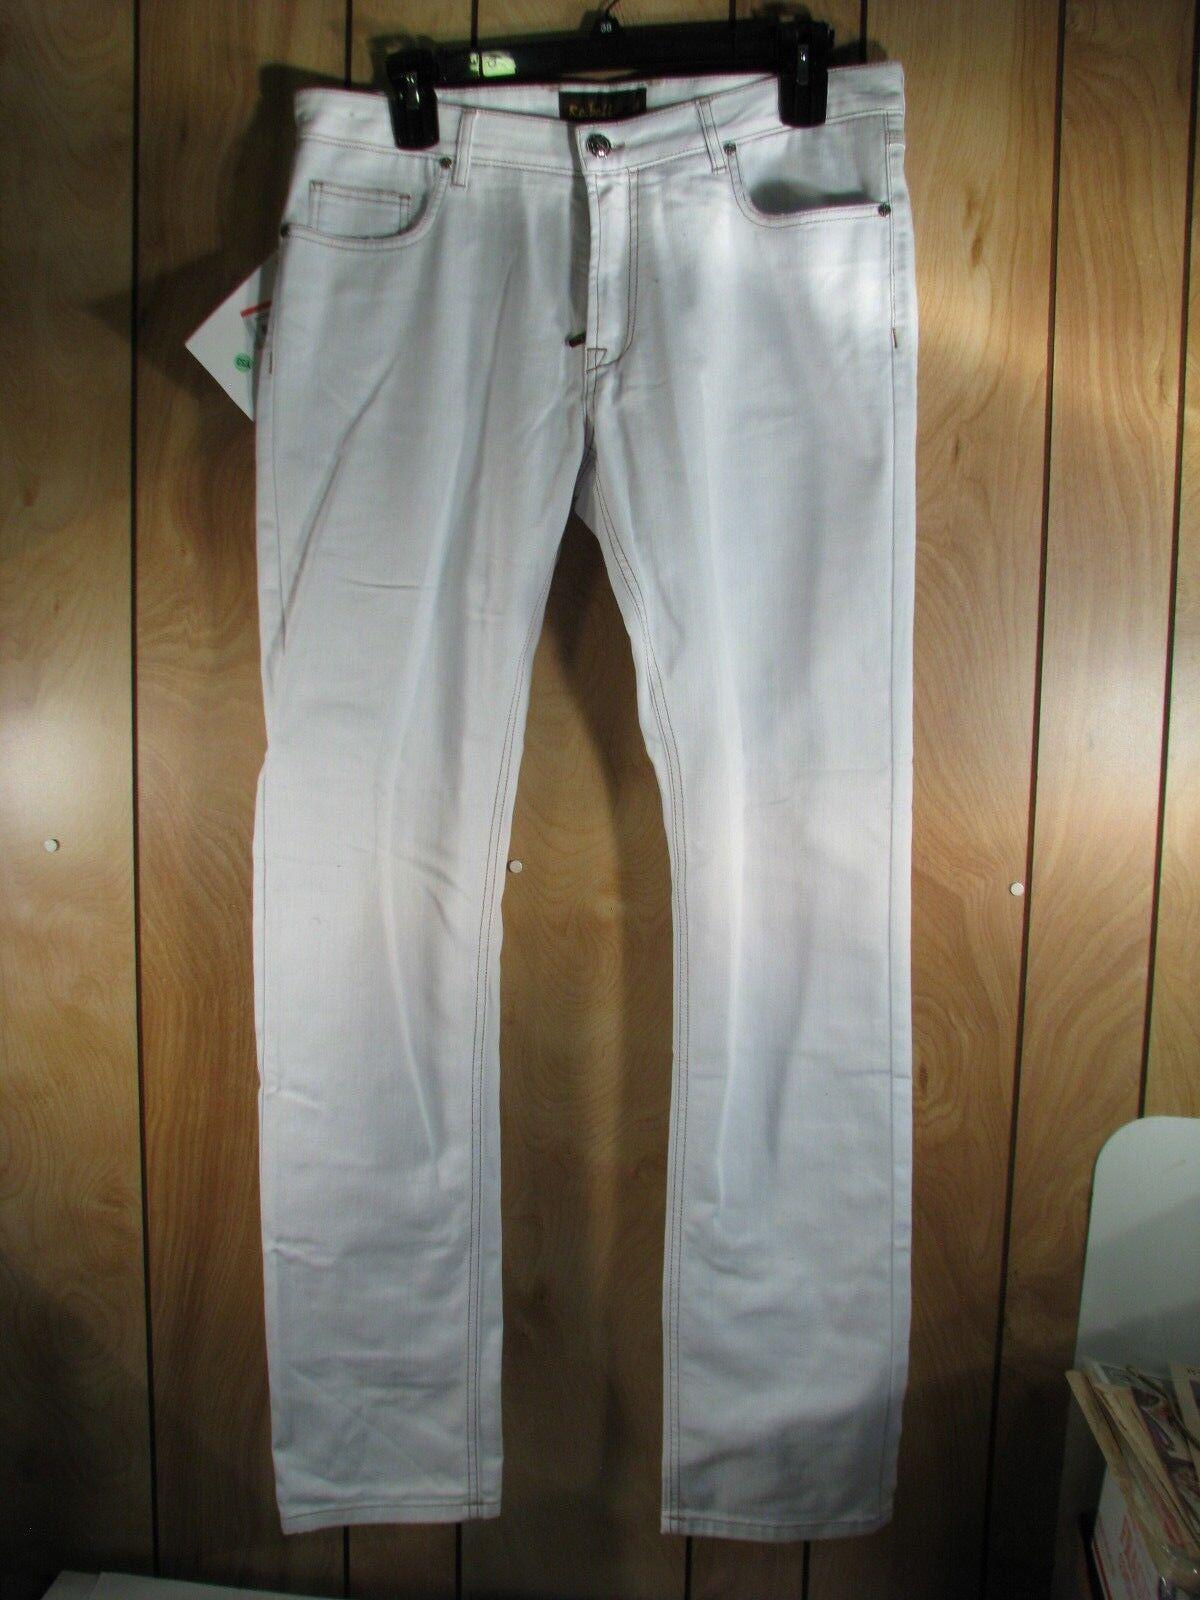 REBELL  White Washed Denim Jeans  Pants  New NWT 38 X 35 Slim   Skinny